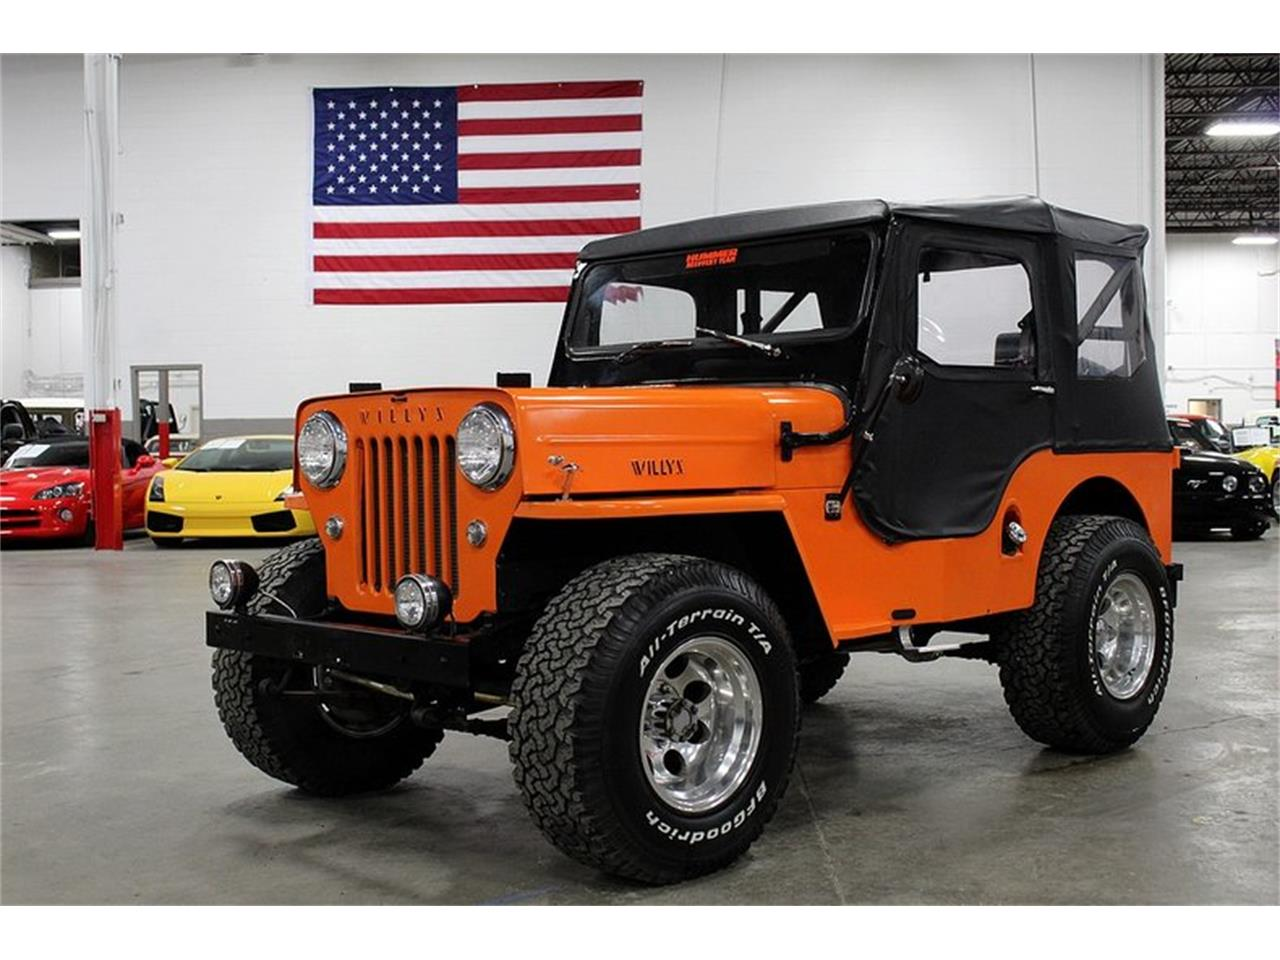 Willys Jeep For Sale >> 1962 Willys Jeep For Sale In Kentwood Mi Classiccarsbay Com